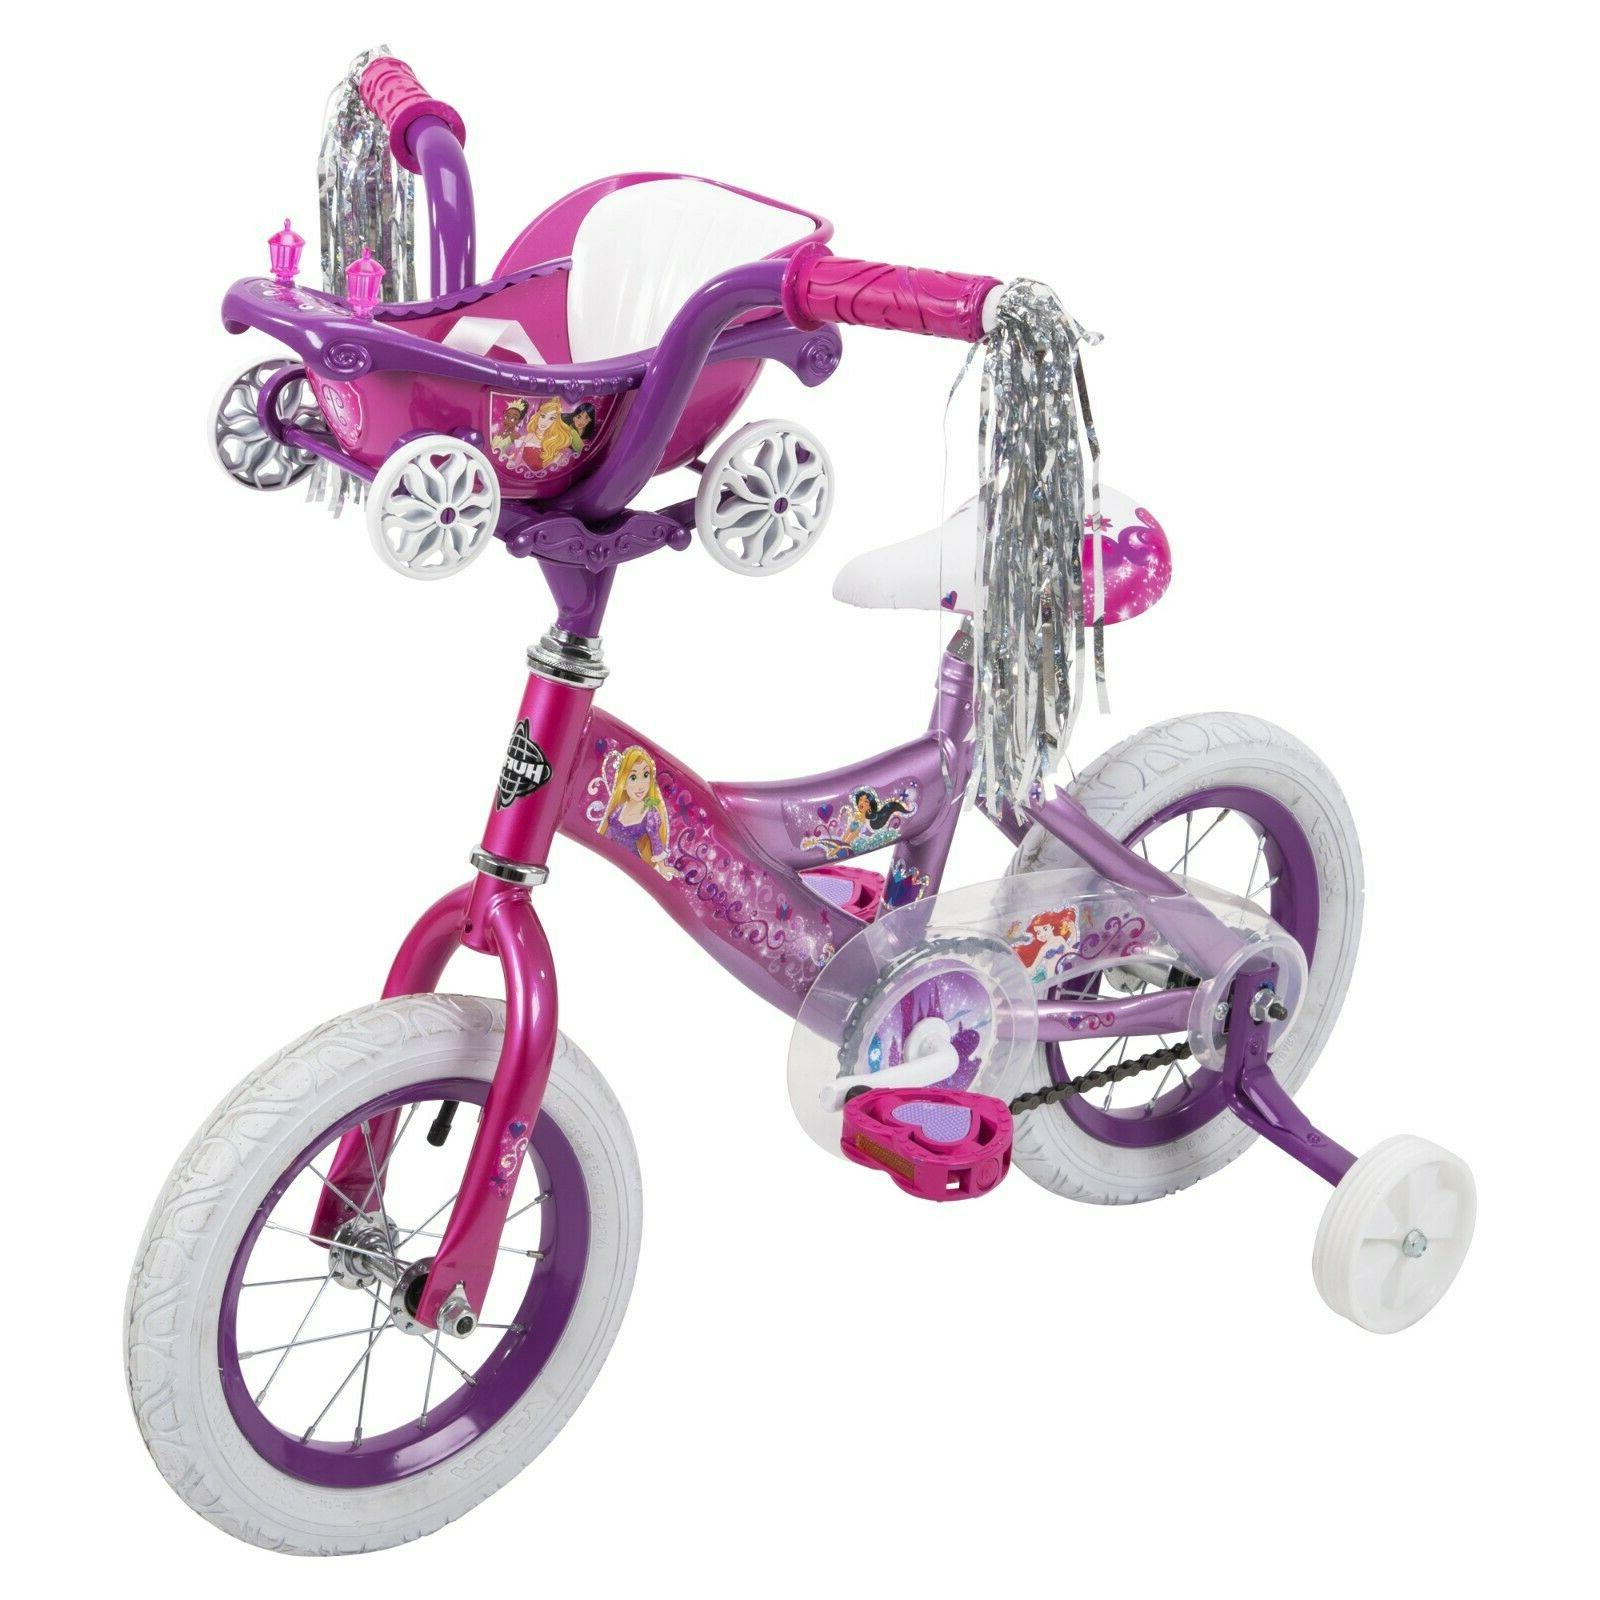 disney princess kid s bike 12 inch